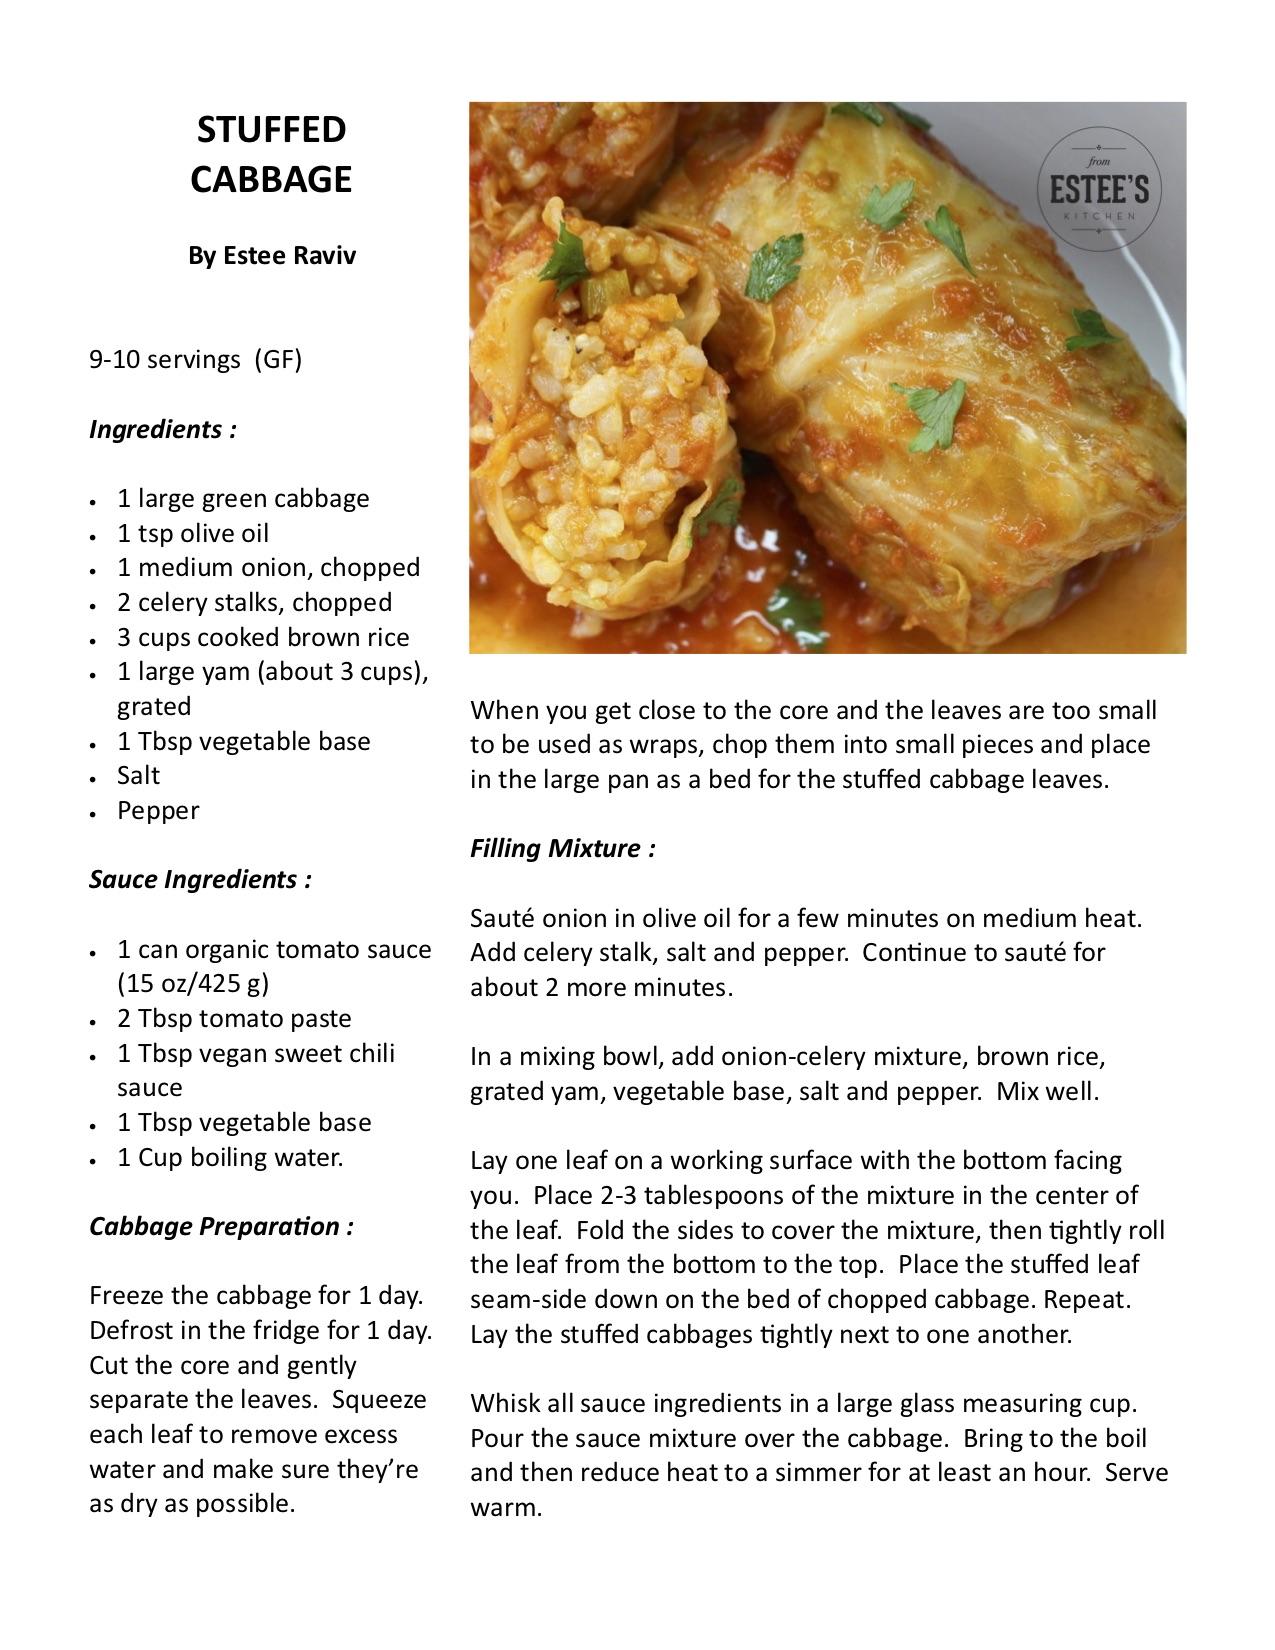 Estee Vegan Lifestyle Magazine Article pg 5.jpg